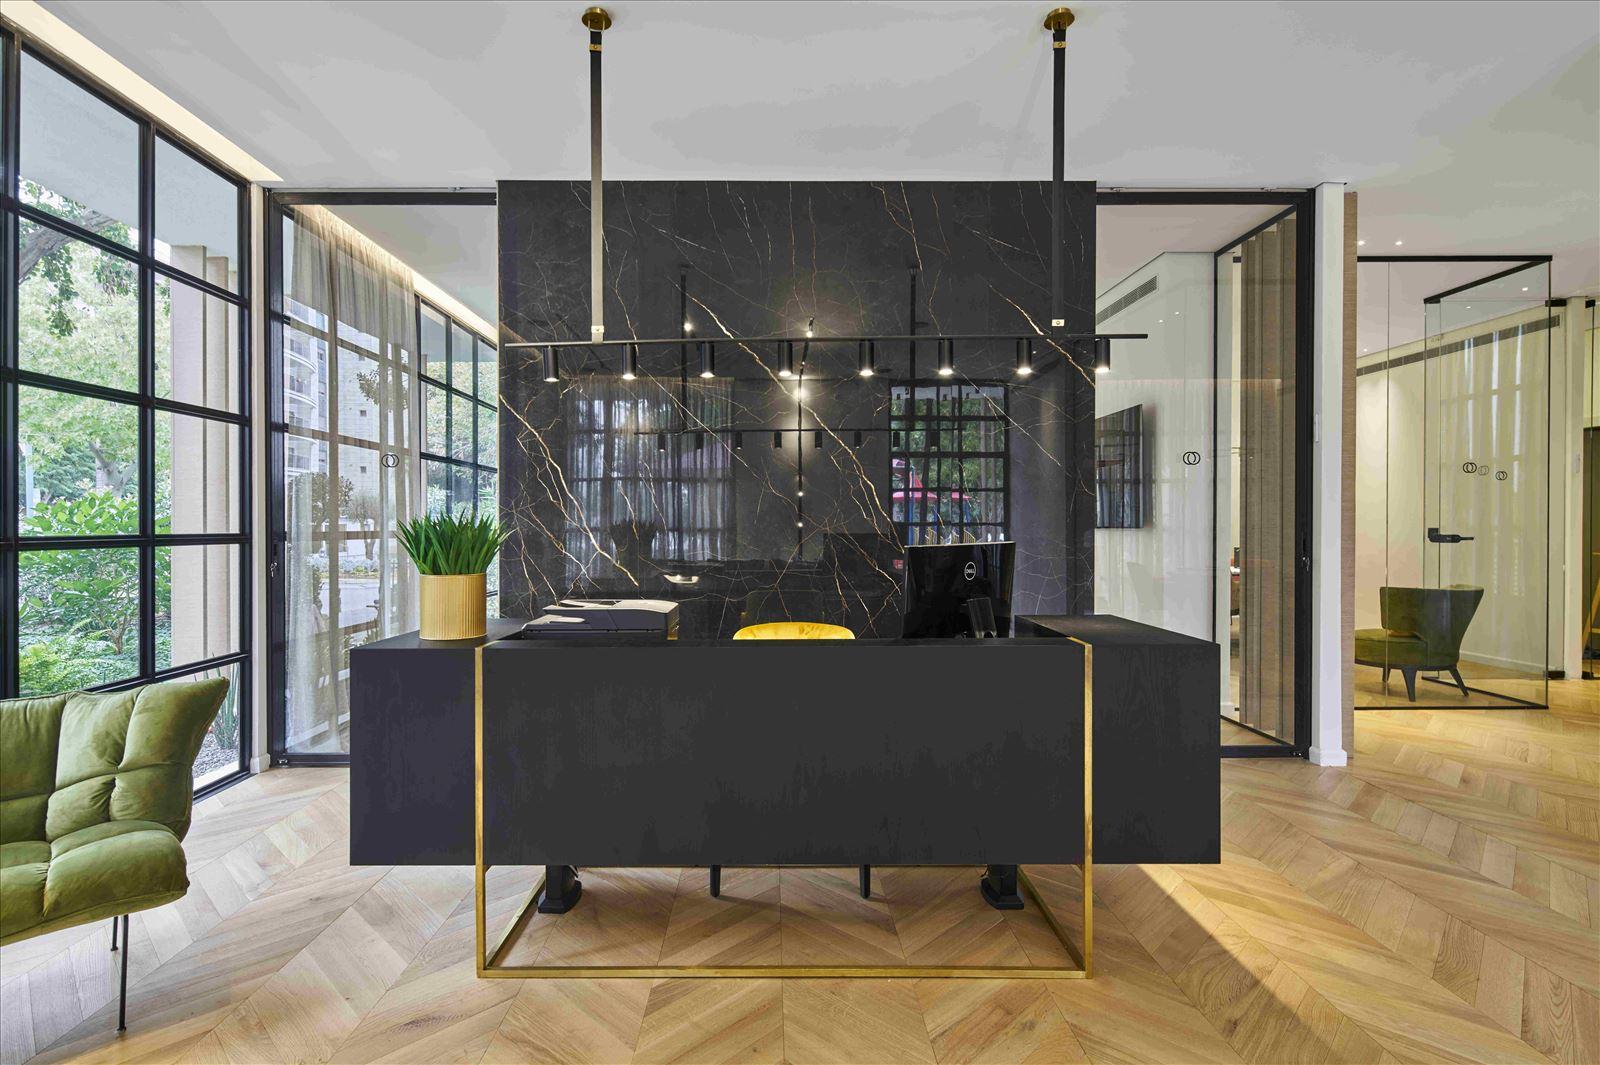 sales office - onone תאורת המזכירות מבית קמחי תאורה